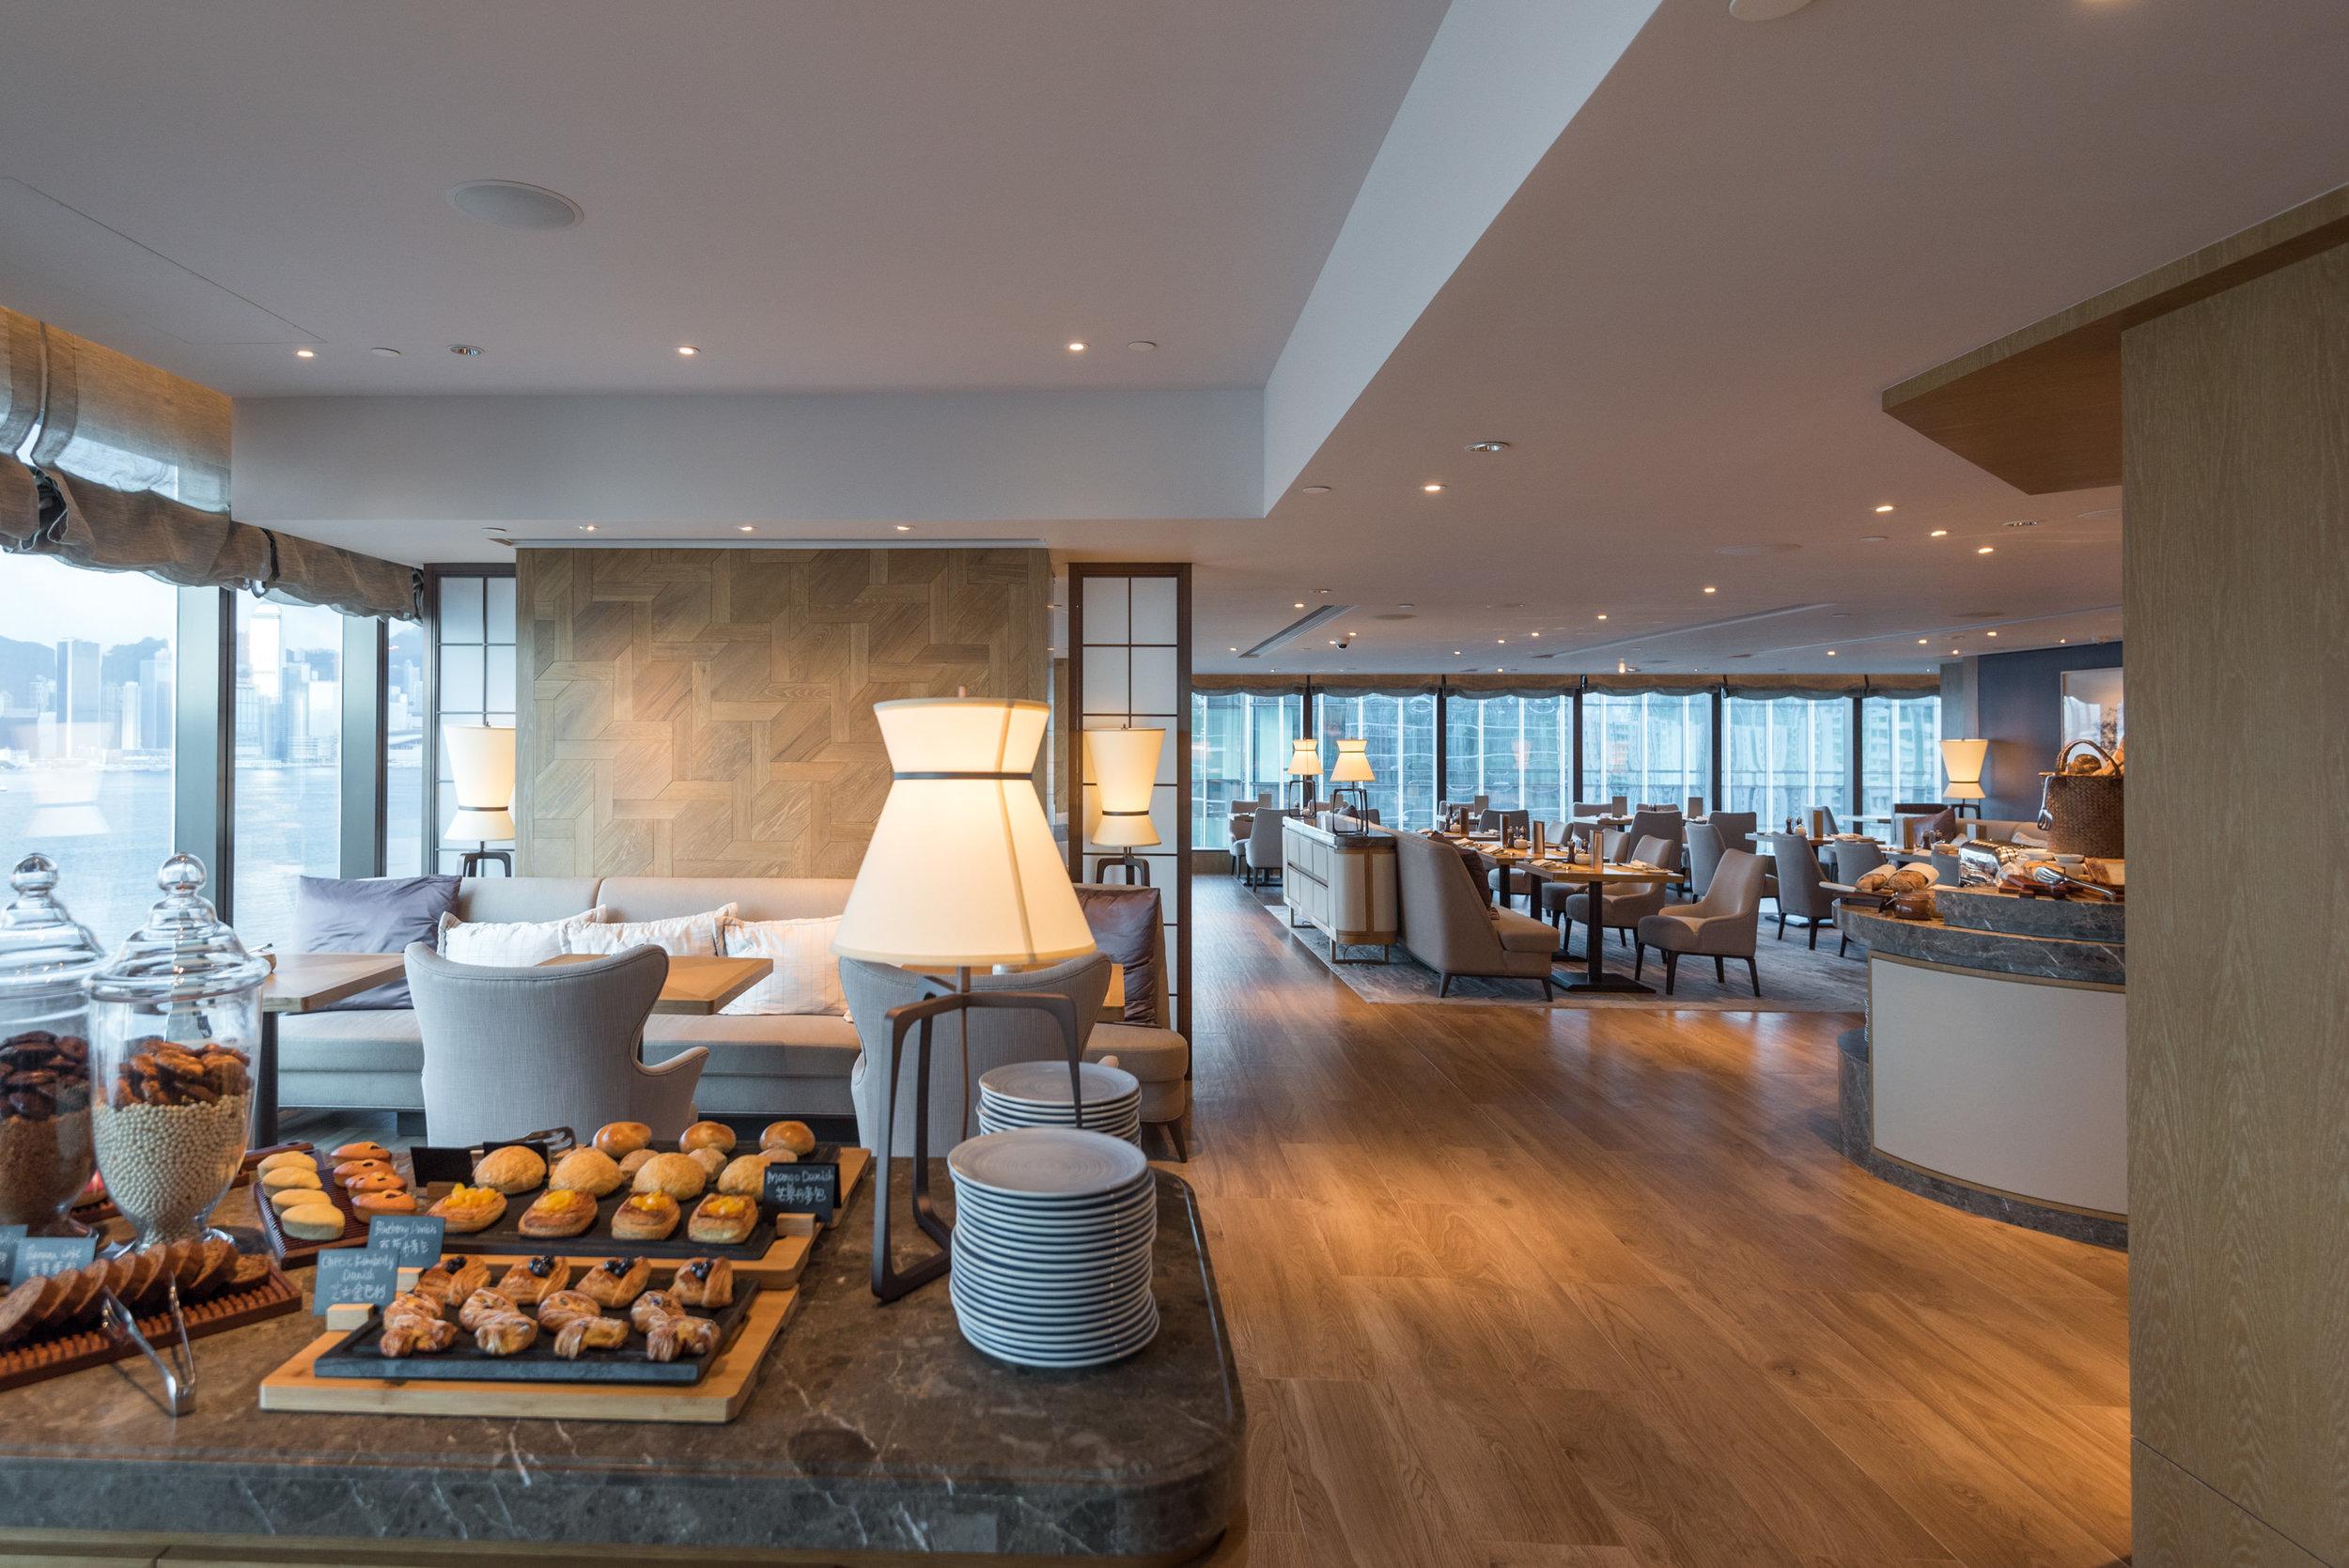 Interiors  The Club - Kerry Hotel, Hong Kong